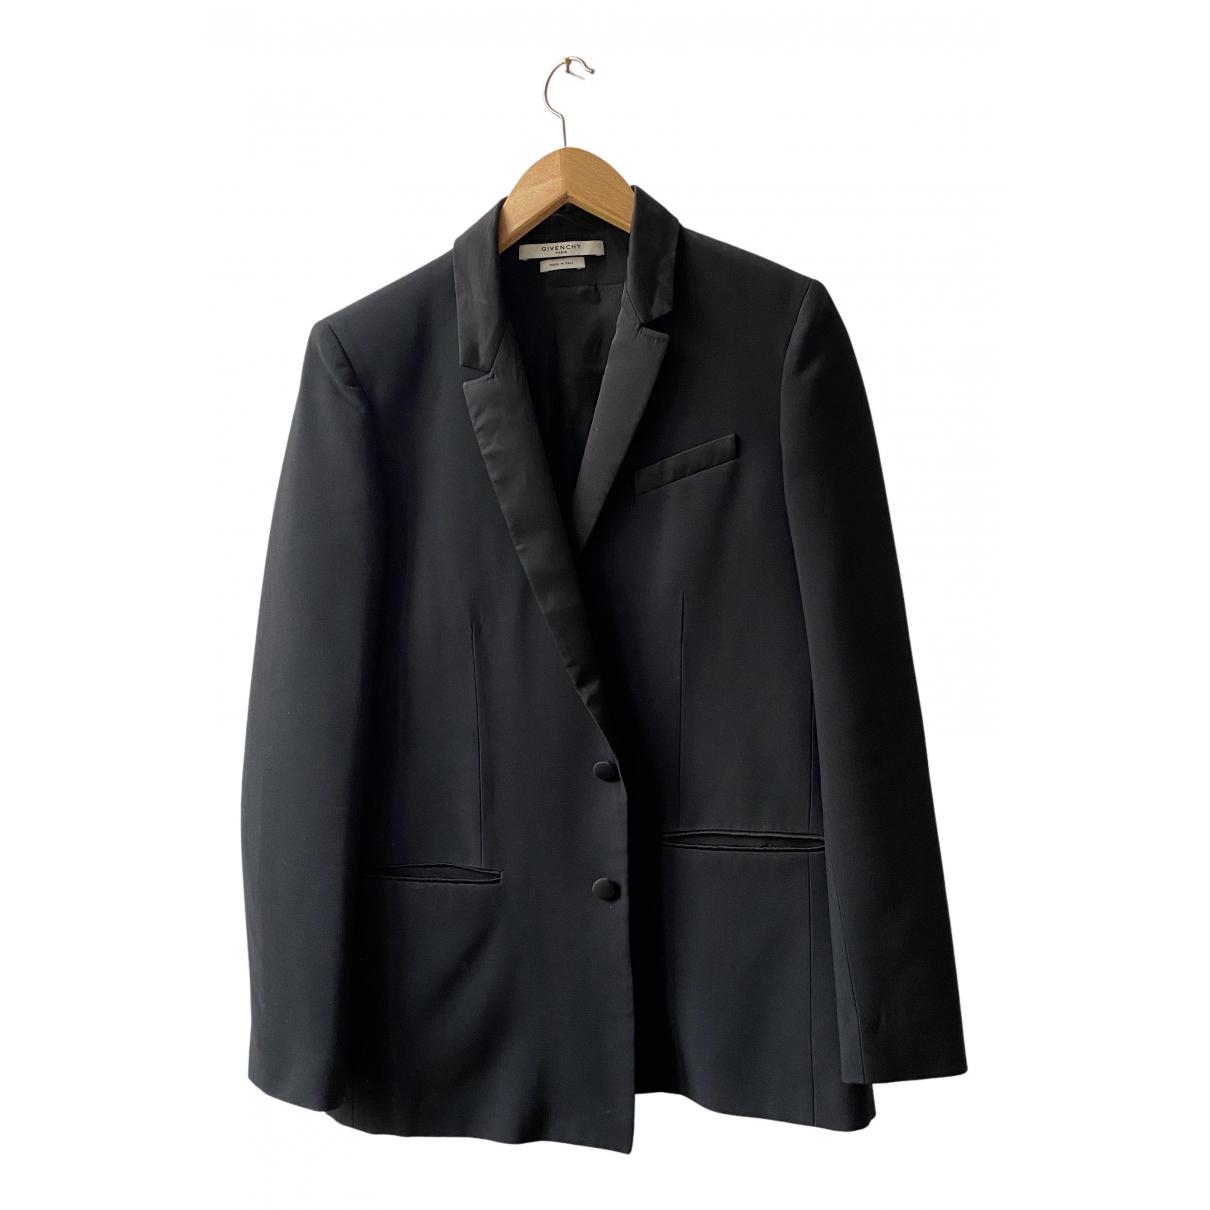 Givenchy N Black jacket for Women 42 FR